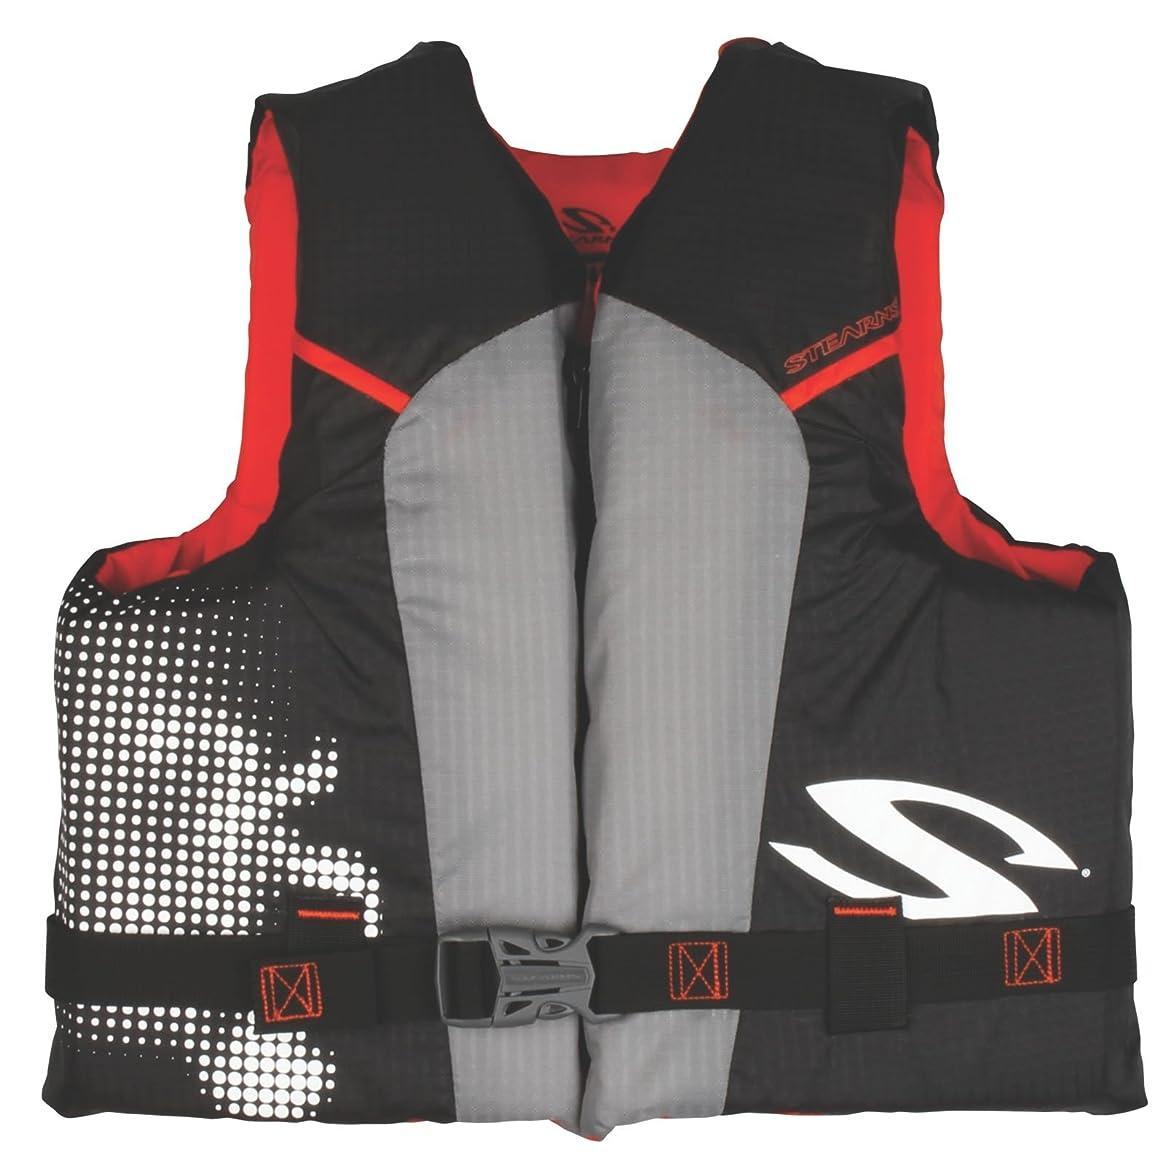 Stearns Youth Paddlesports Vest